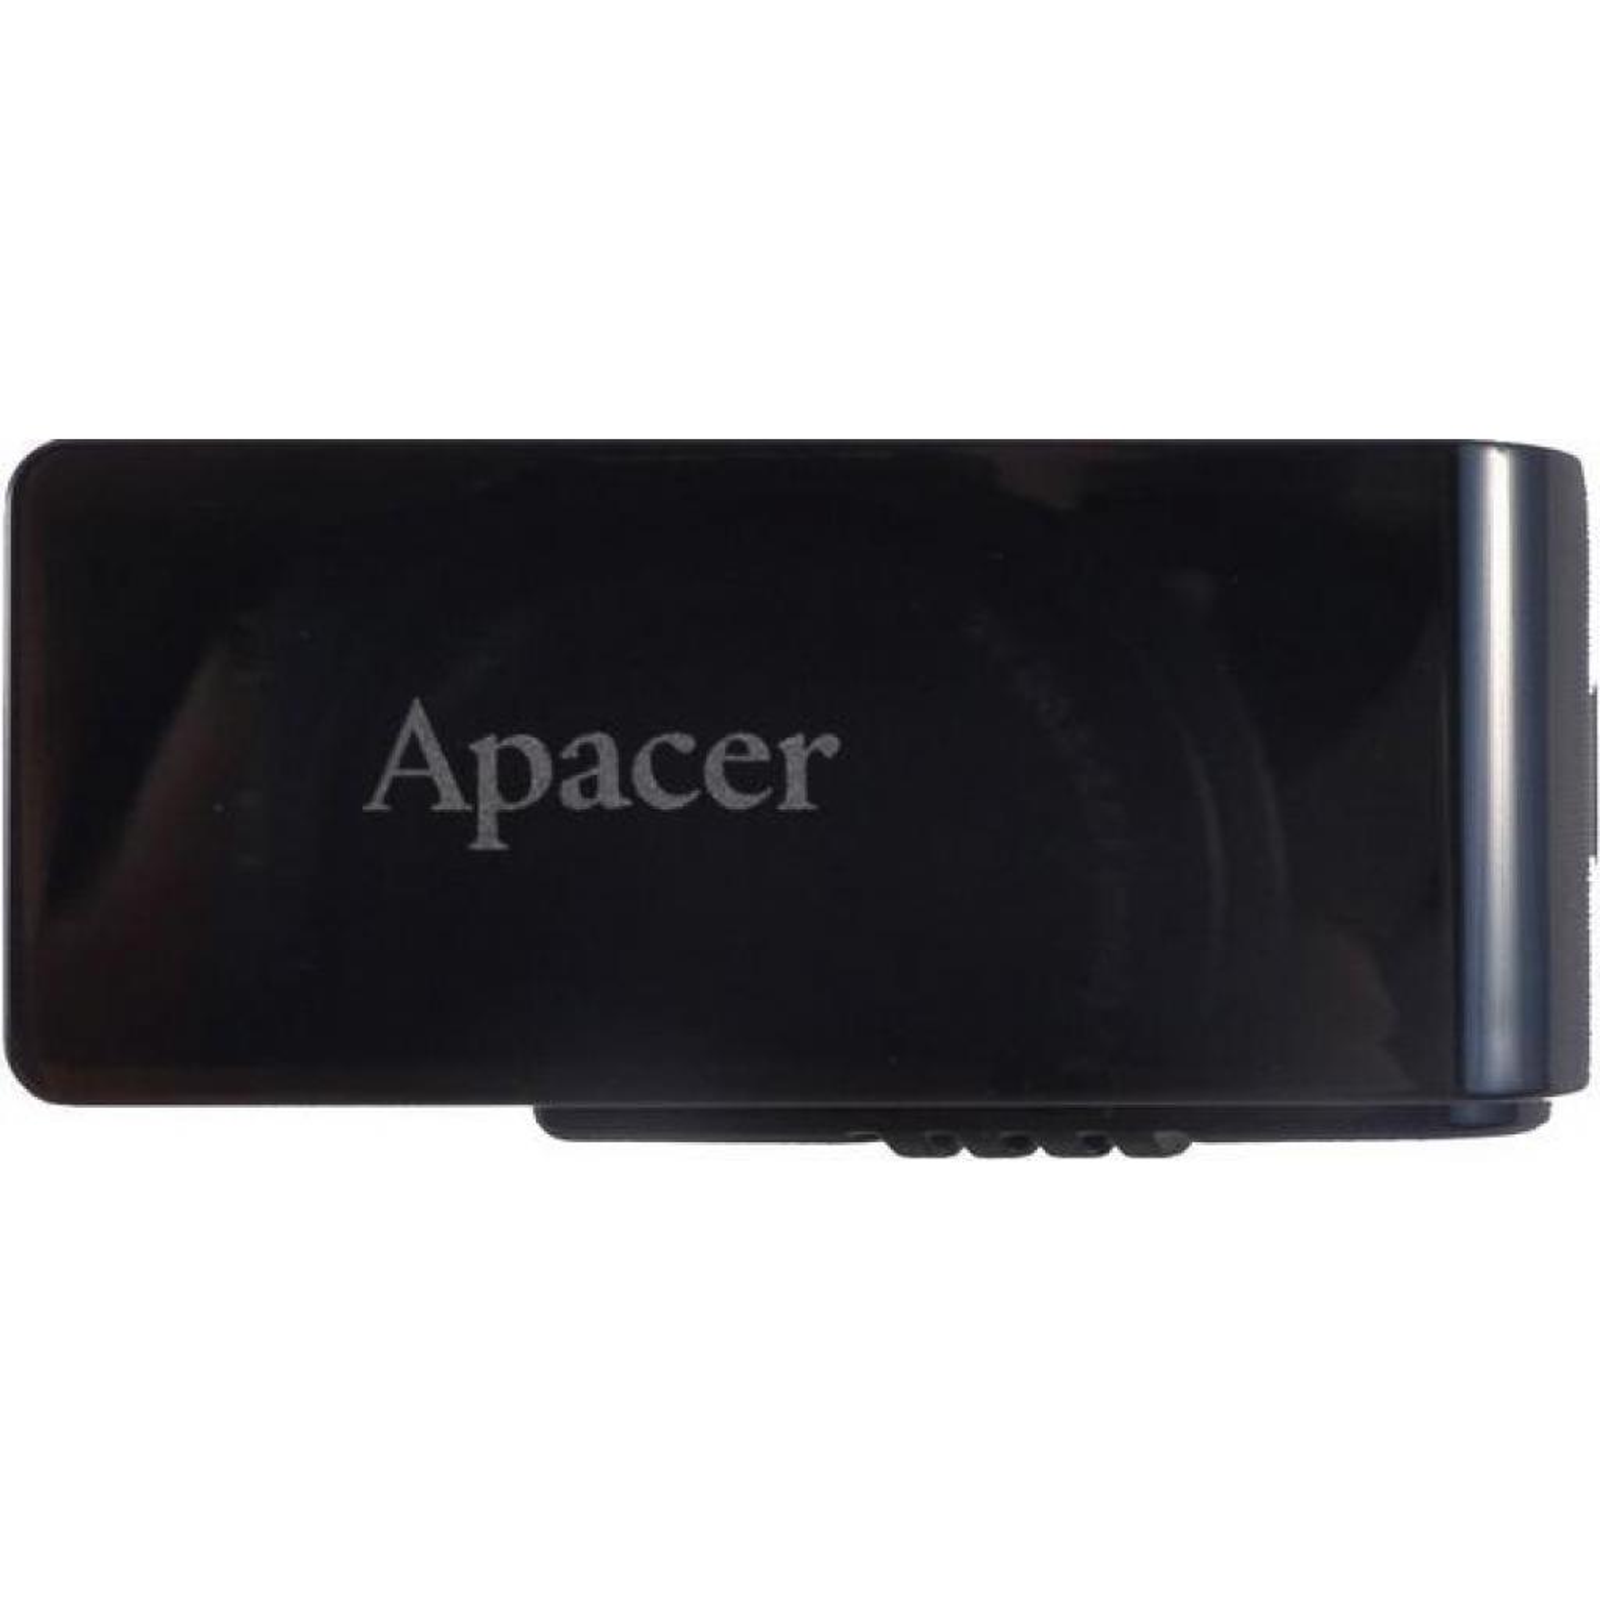 USB флеш накопитель 32GB AH350 Black RP USB3.0 Apacer (AP32GAH350B-1)